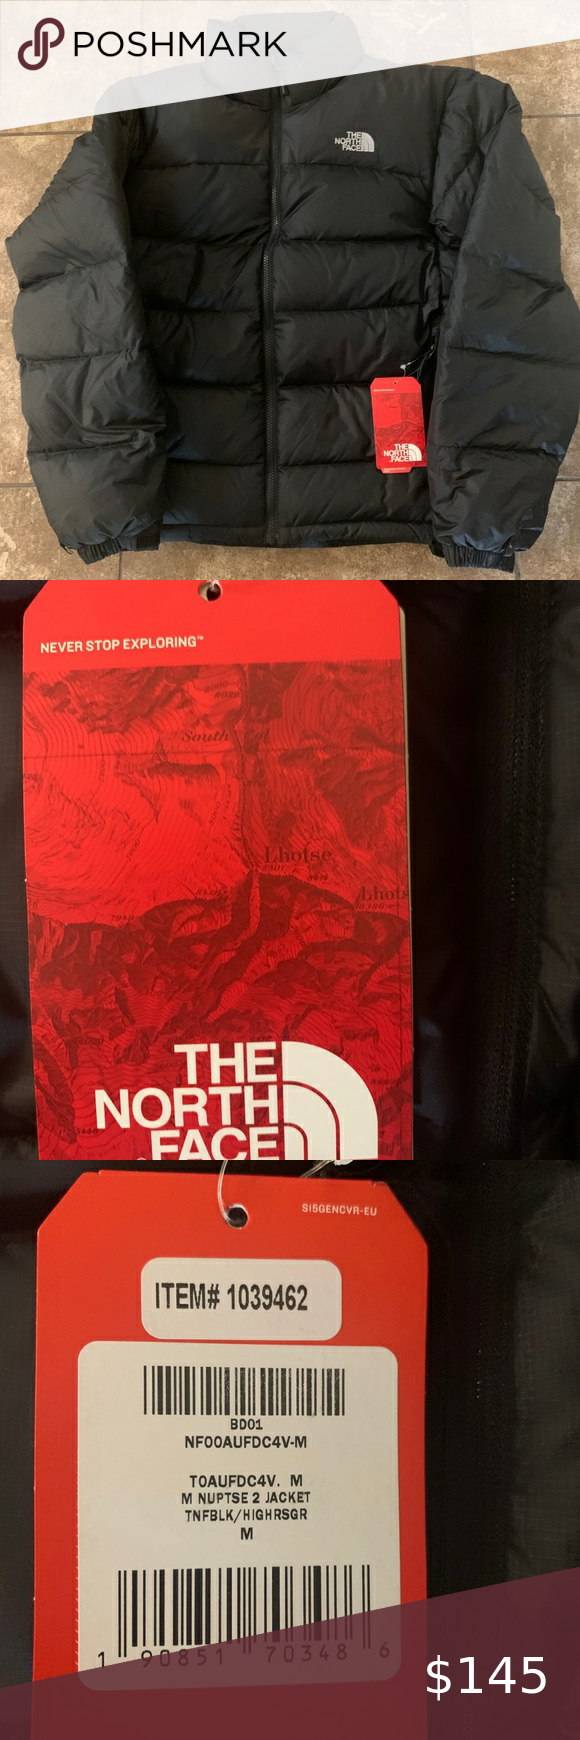 North Face Men S Nuptse 2 New The North Face North Face Mens Black North Face [ 1740 x 580 Pixel ]